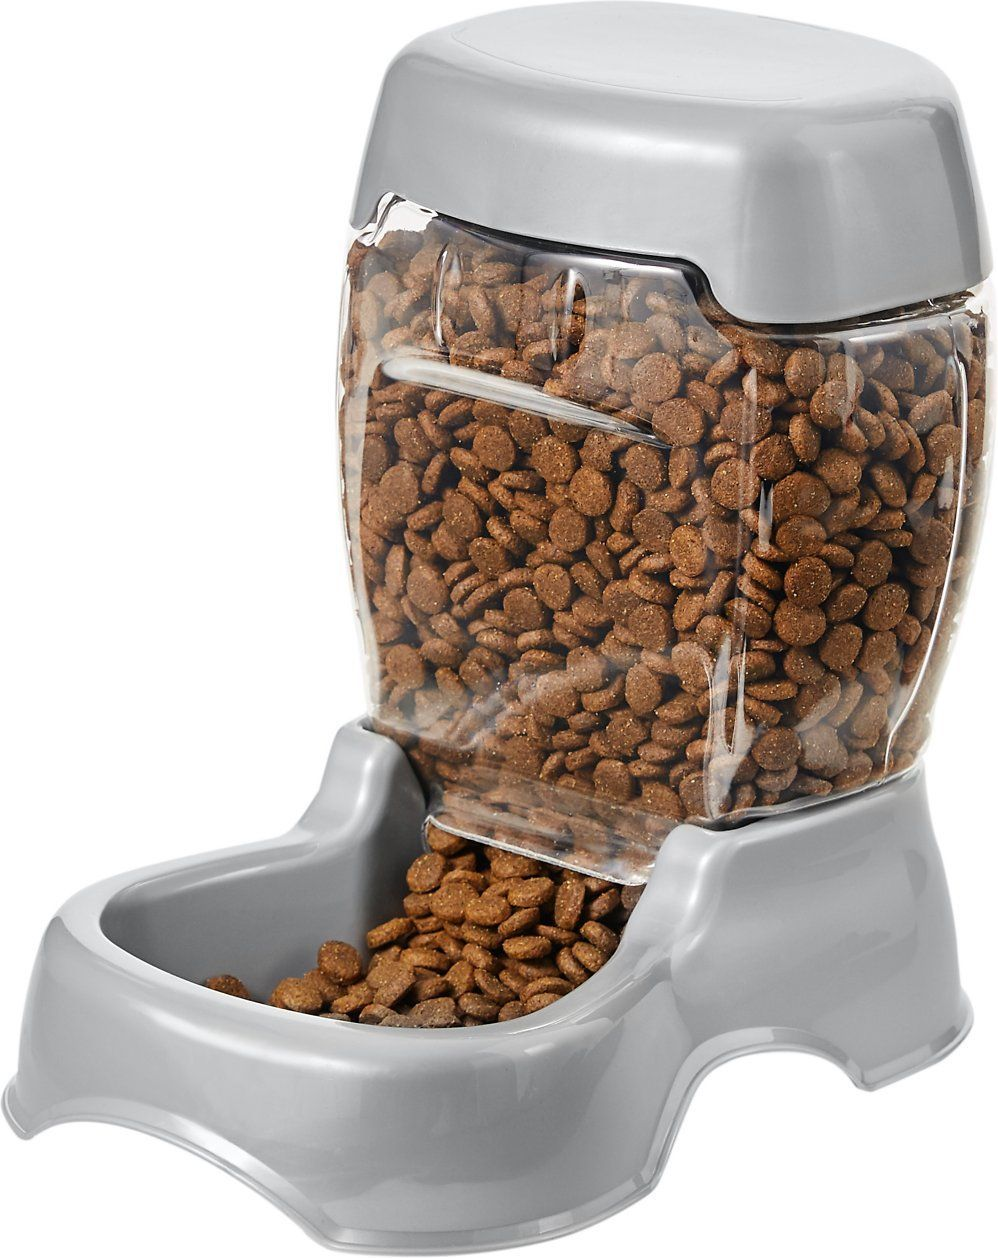 frisco gravity refill pet feeder